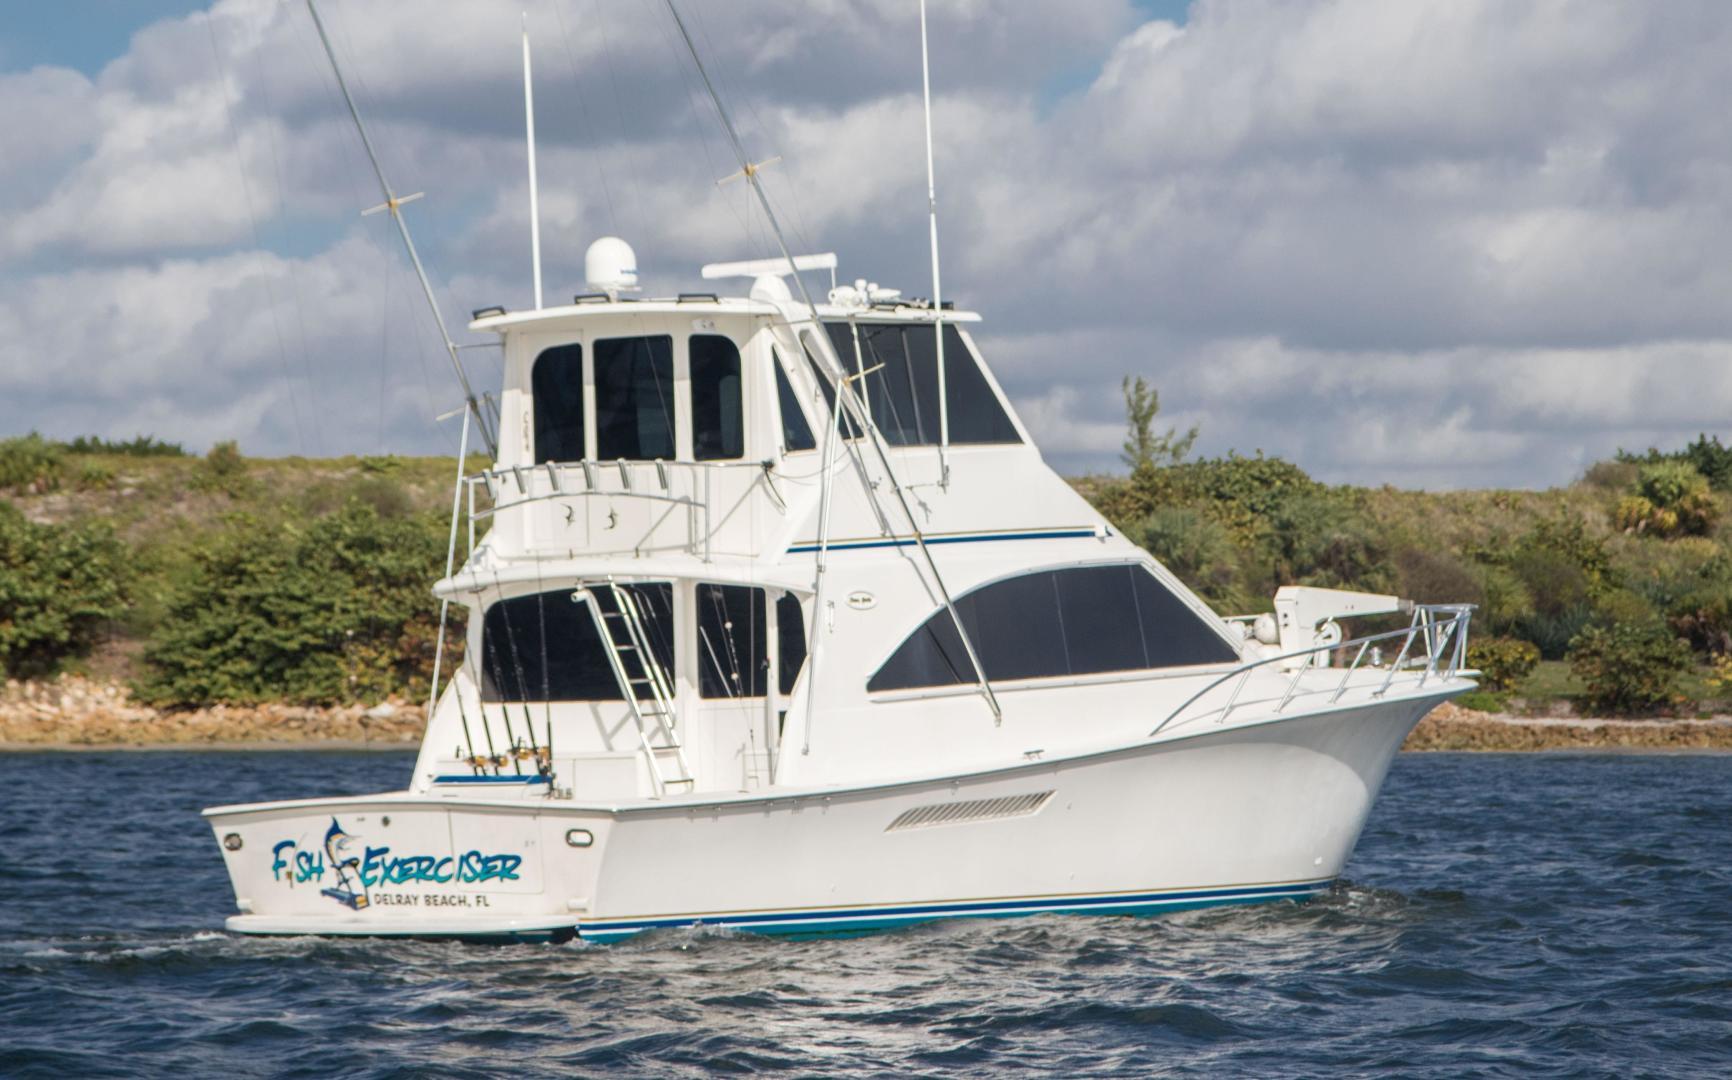 Ocean Yachts 2000-FISH EXERCISER Riviera Beach-Florida-United States-1552077 | Thumbnail